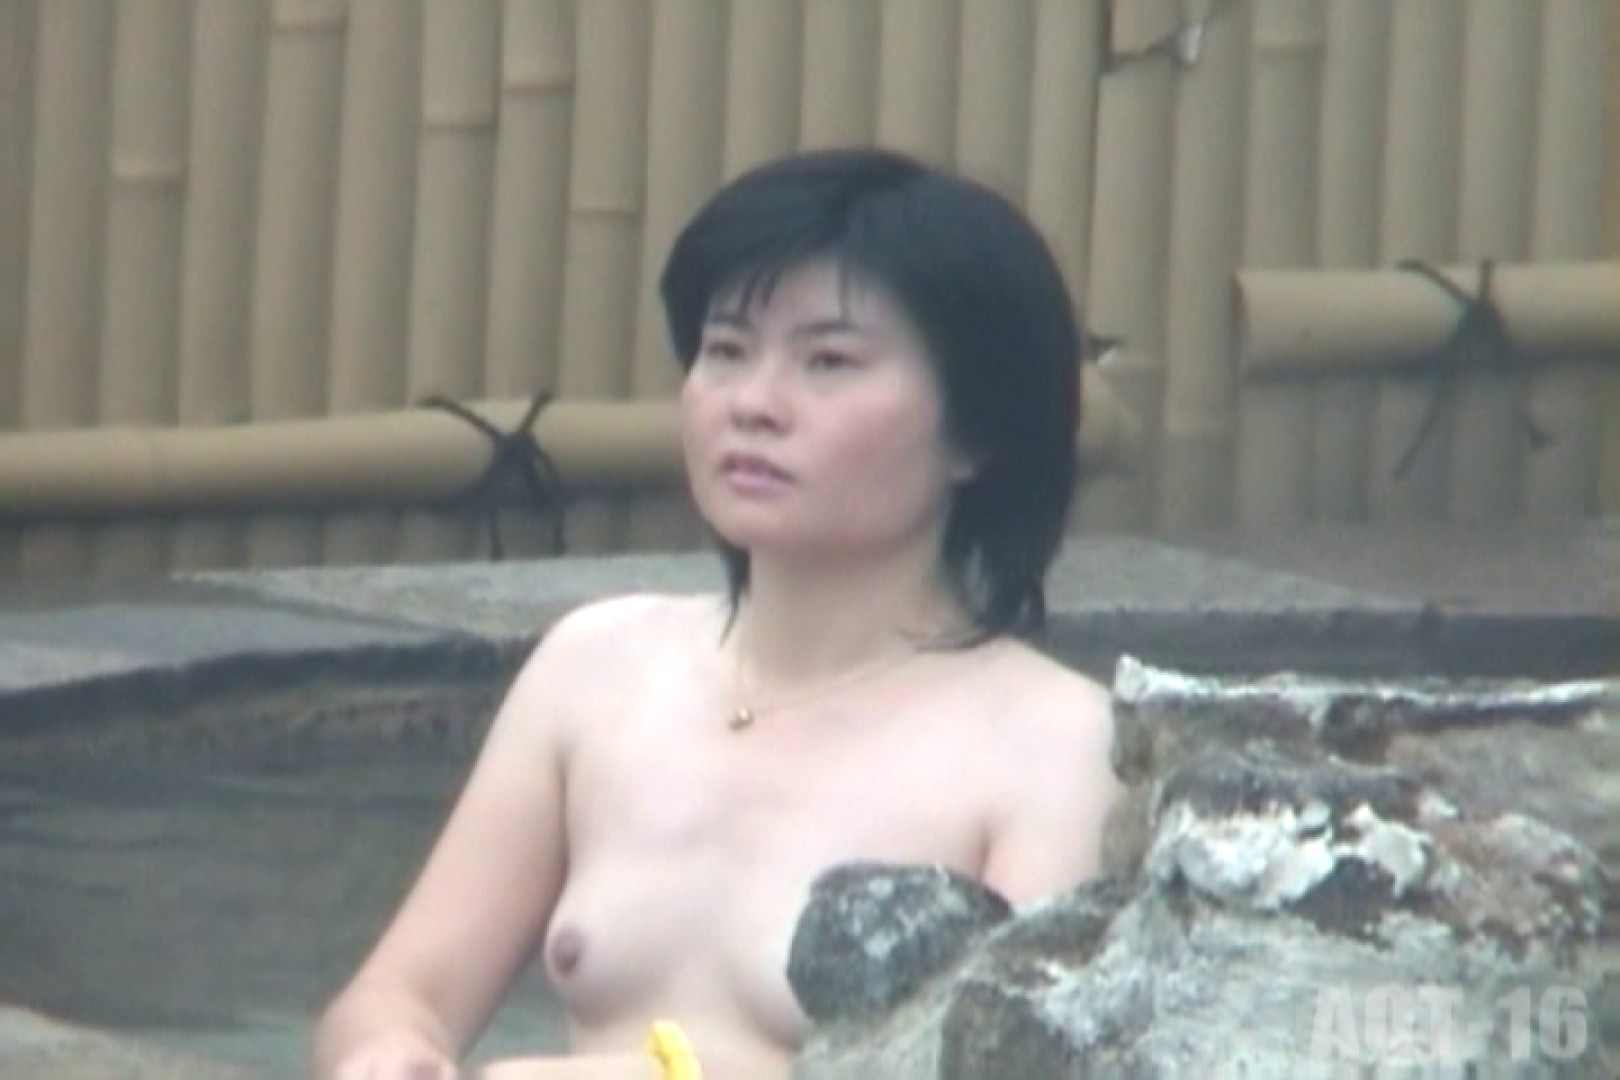 Aquaな露天風呂Vol.840 露天風呂編 | 盗撮シリーズ  97PIX 25